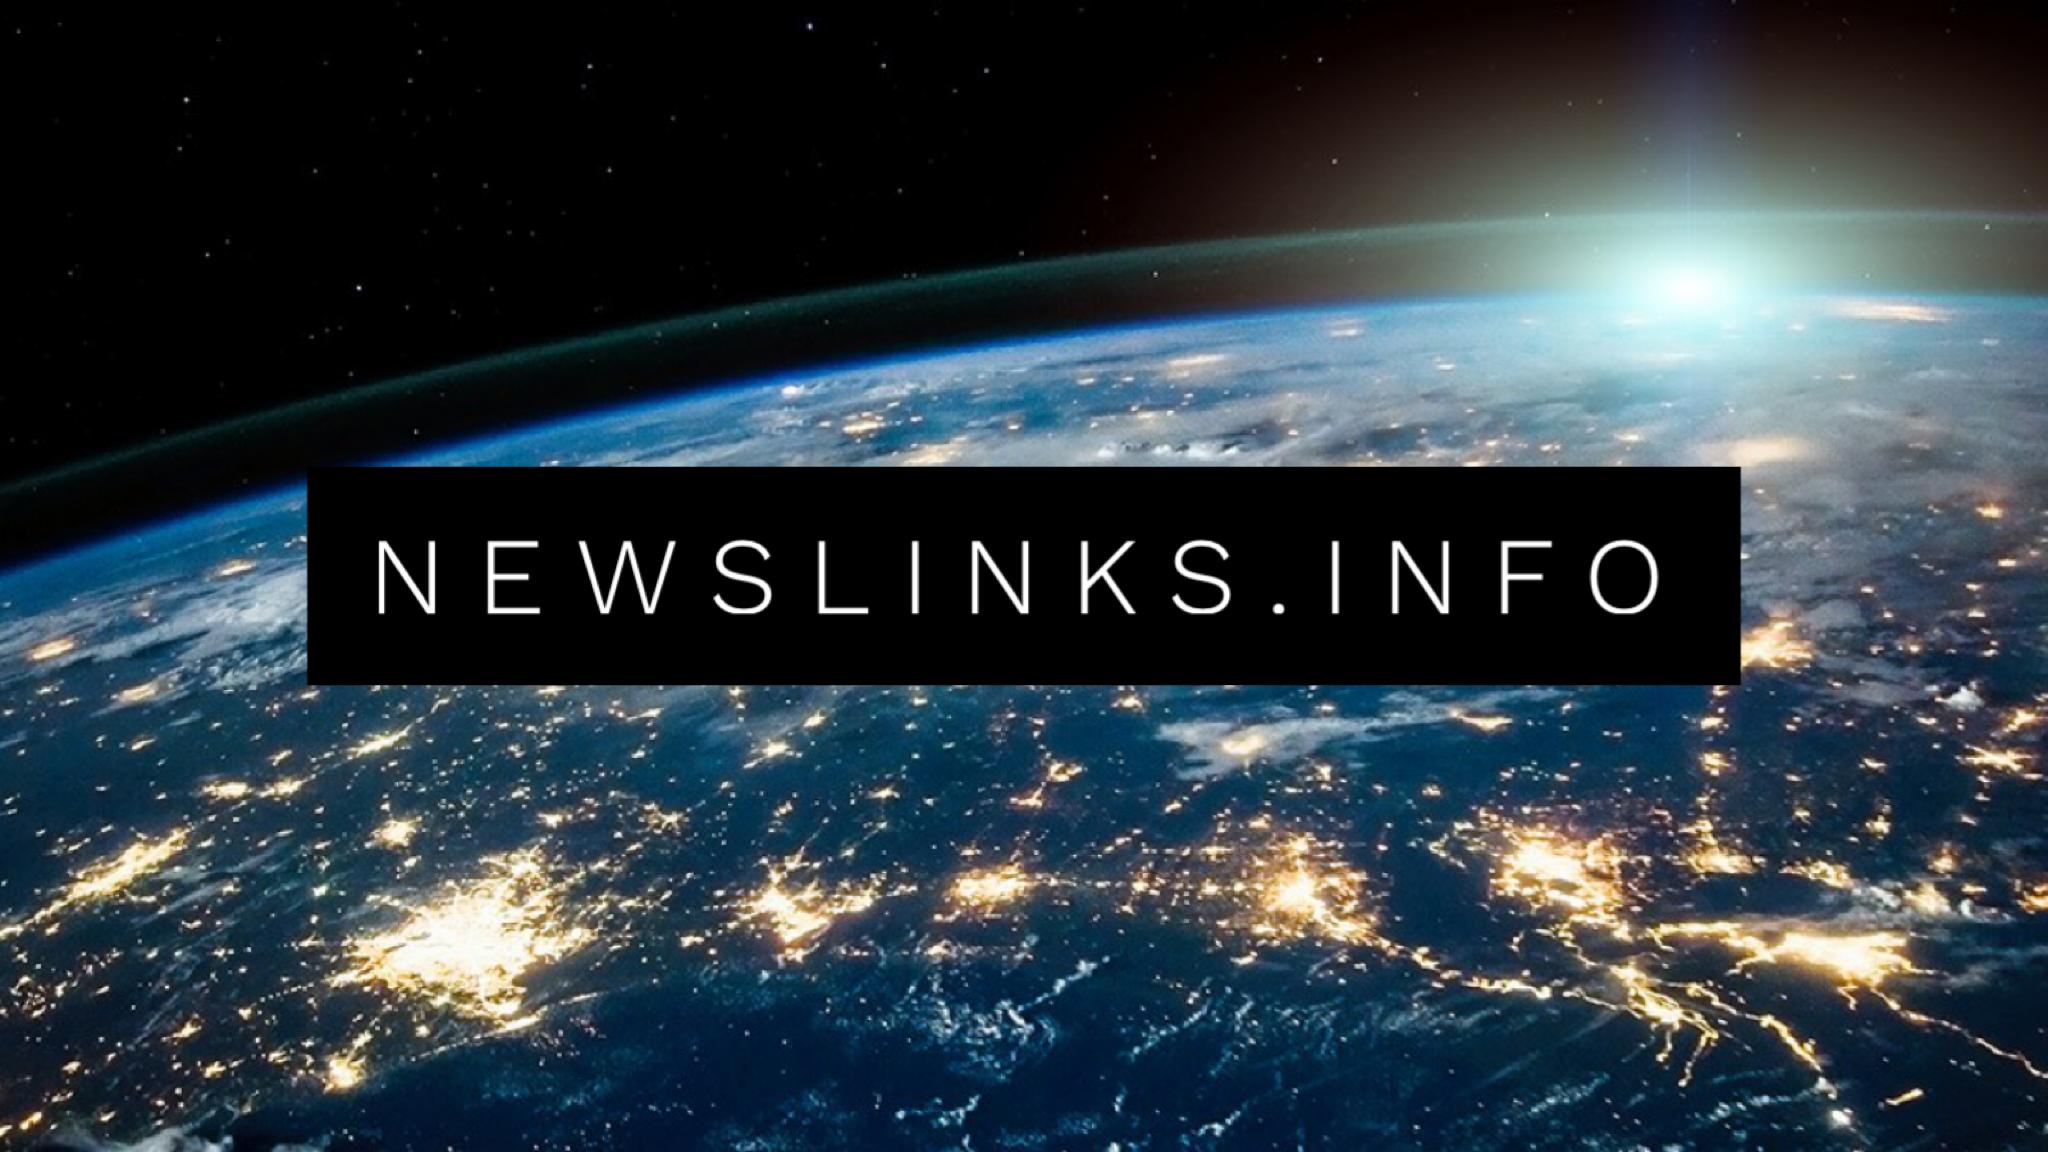 NEWSLINKS.INFO